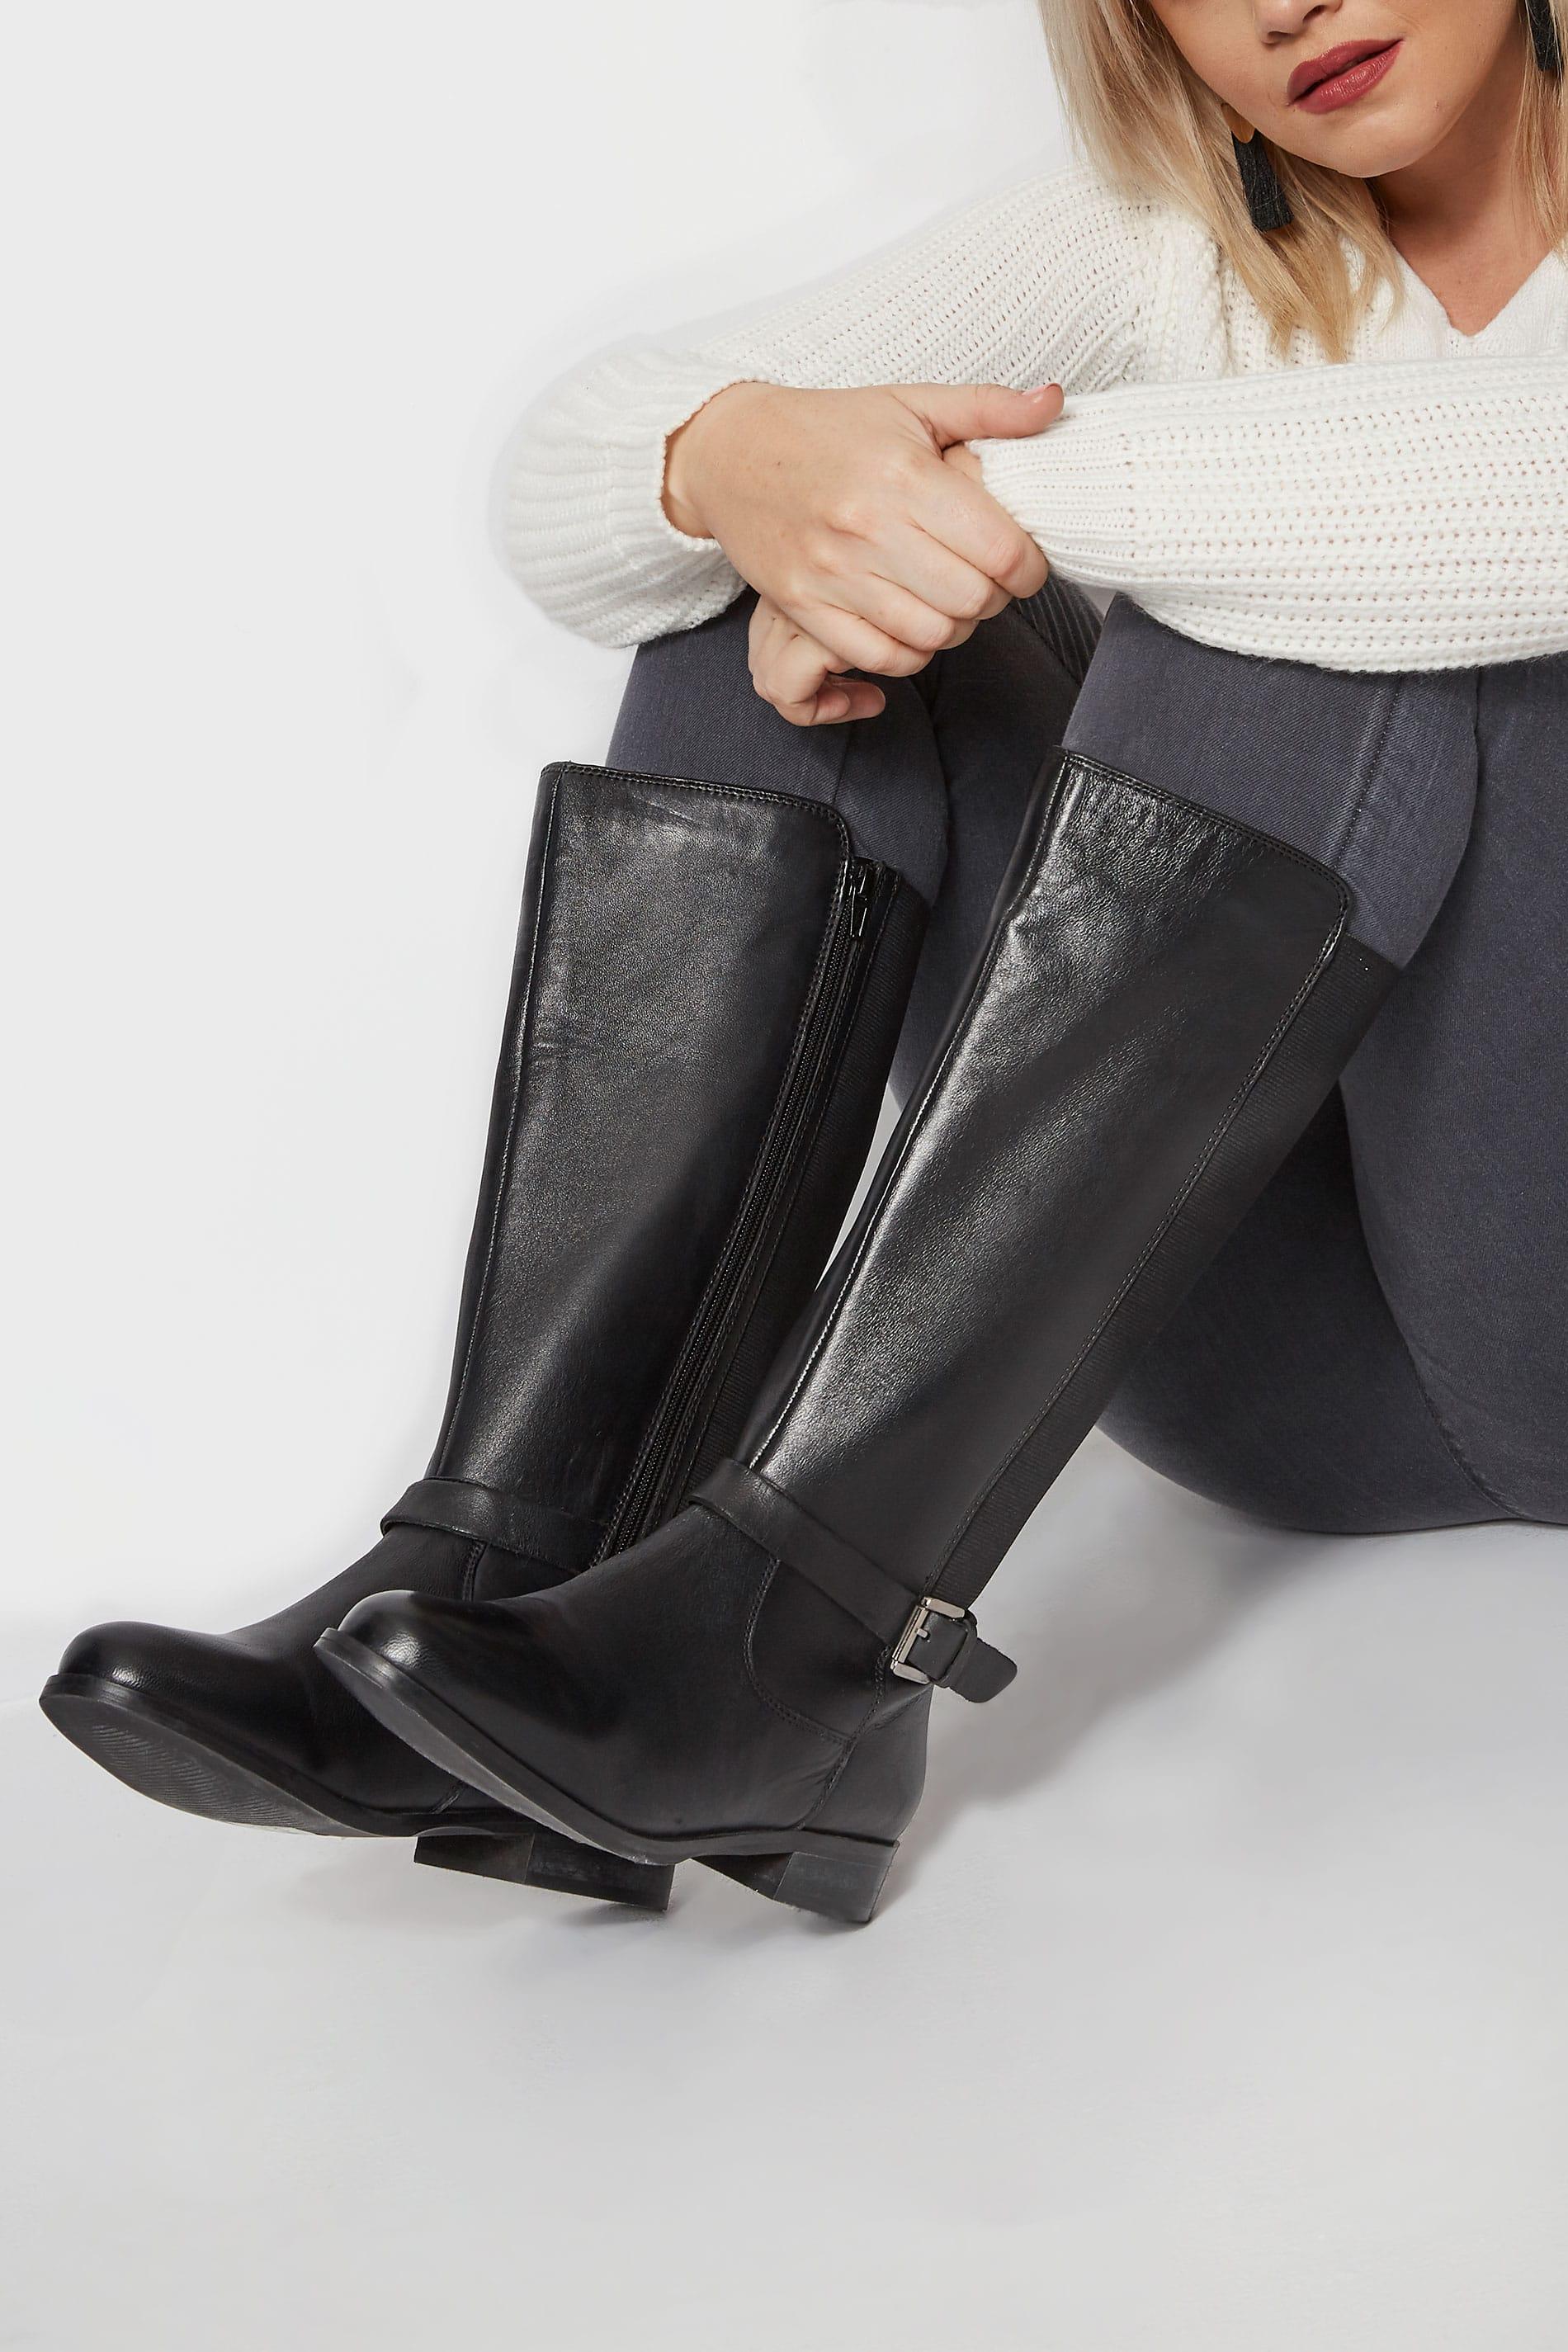 black leather bar shoe eee fit